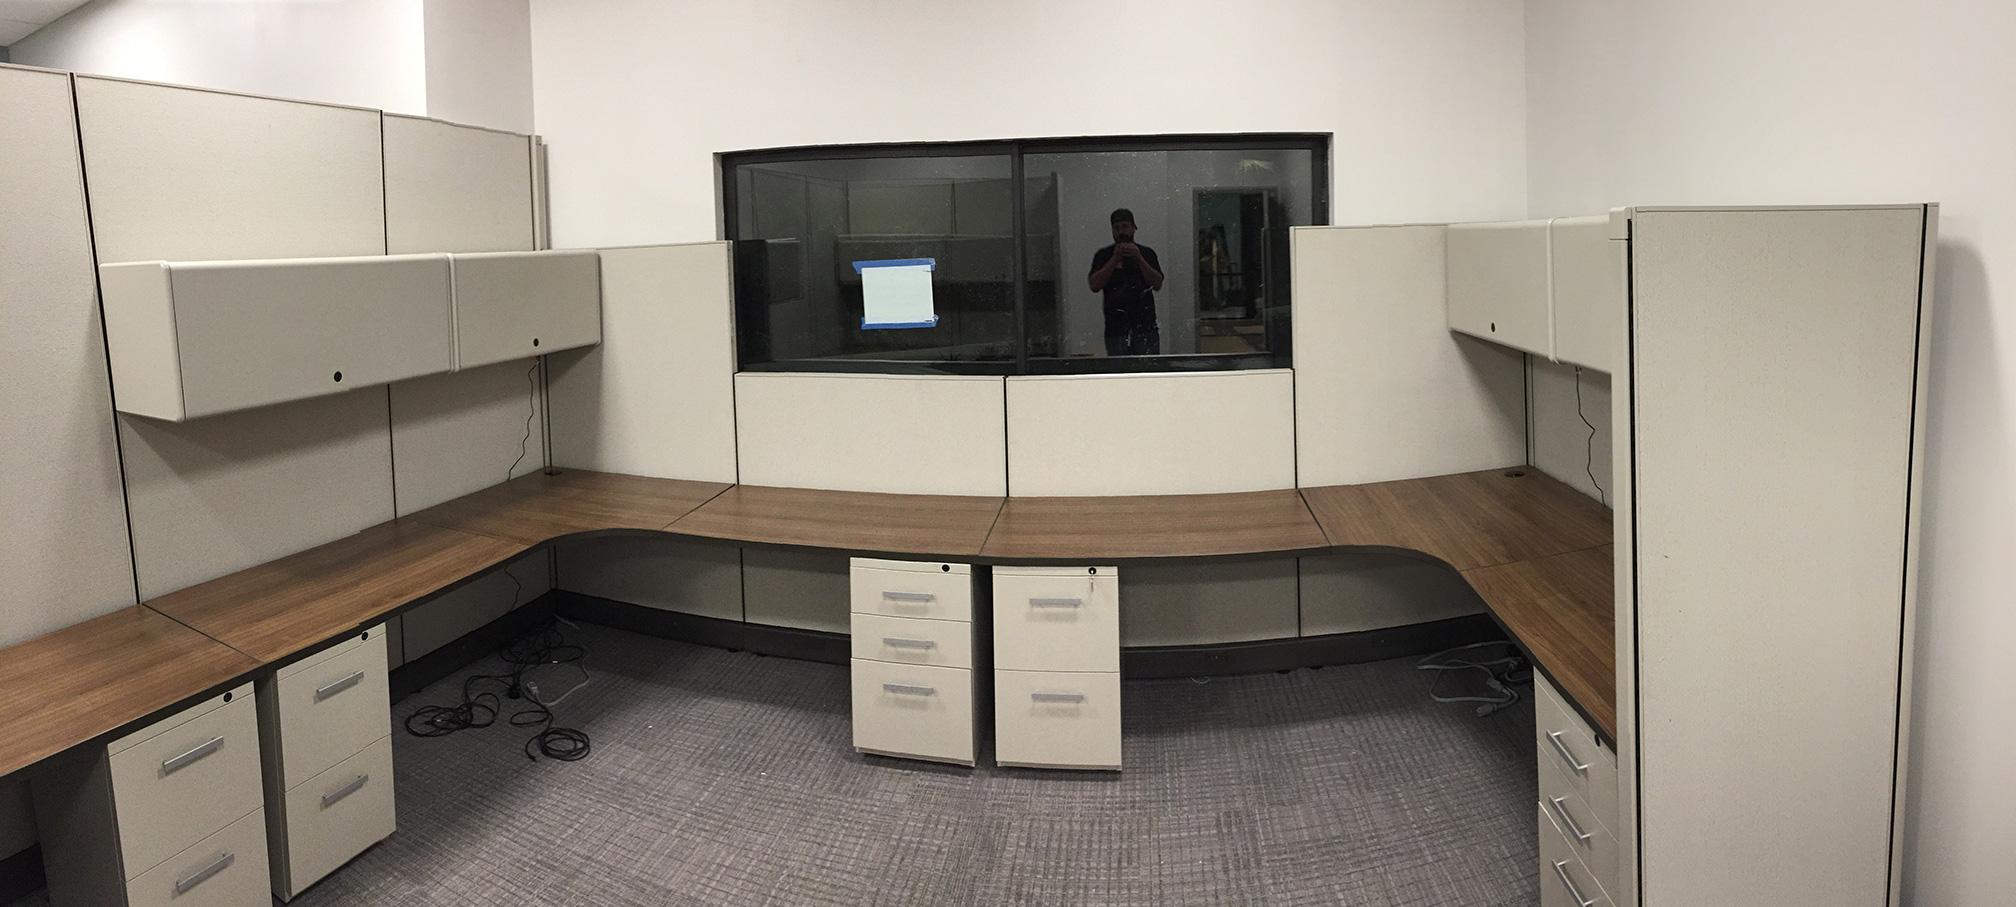 new-cube-manasota-office-supplies-llc.jpg